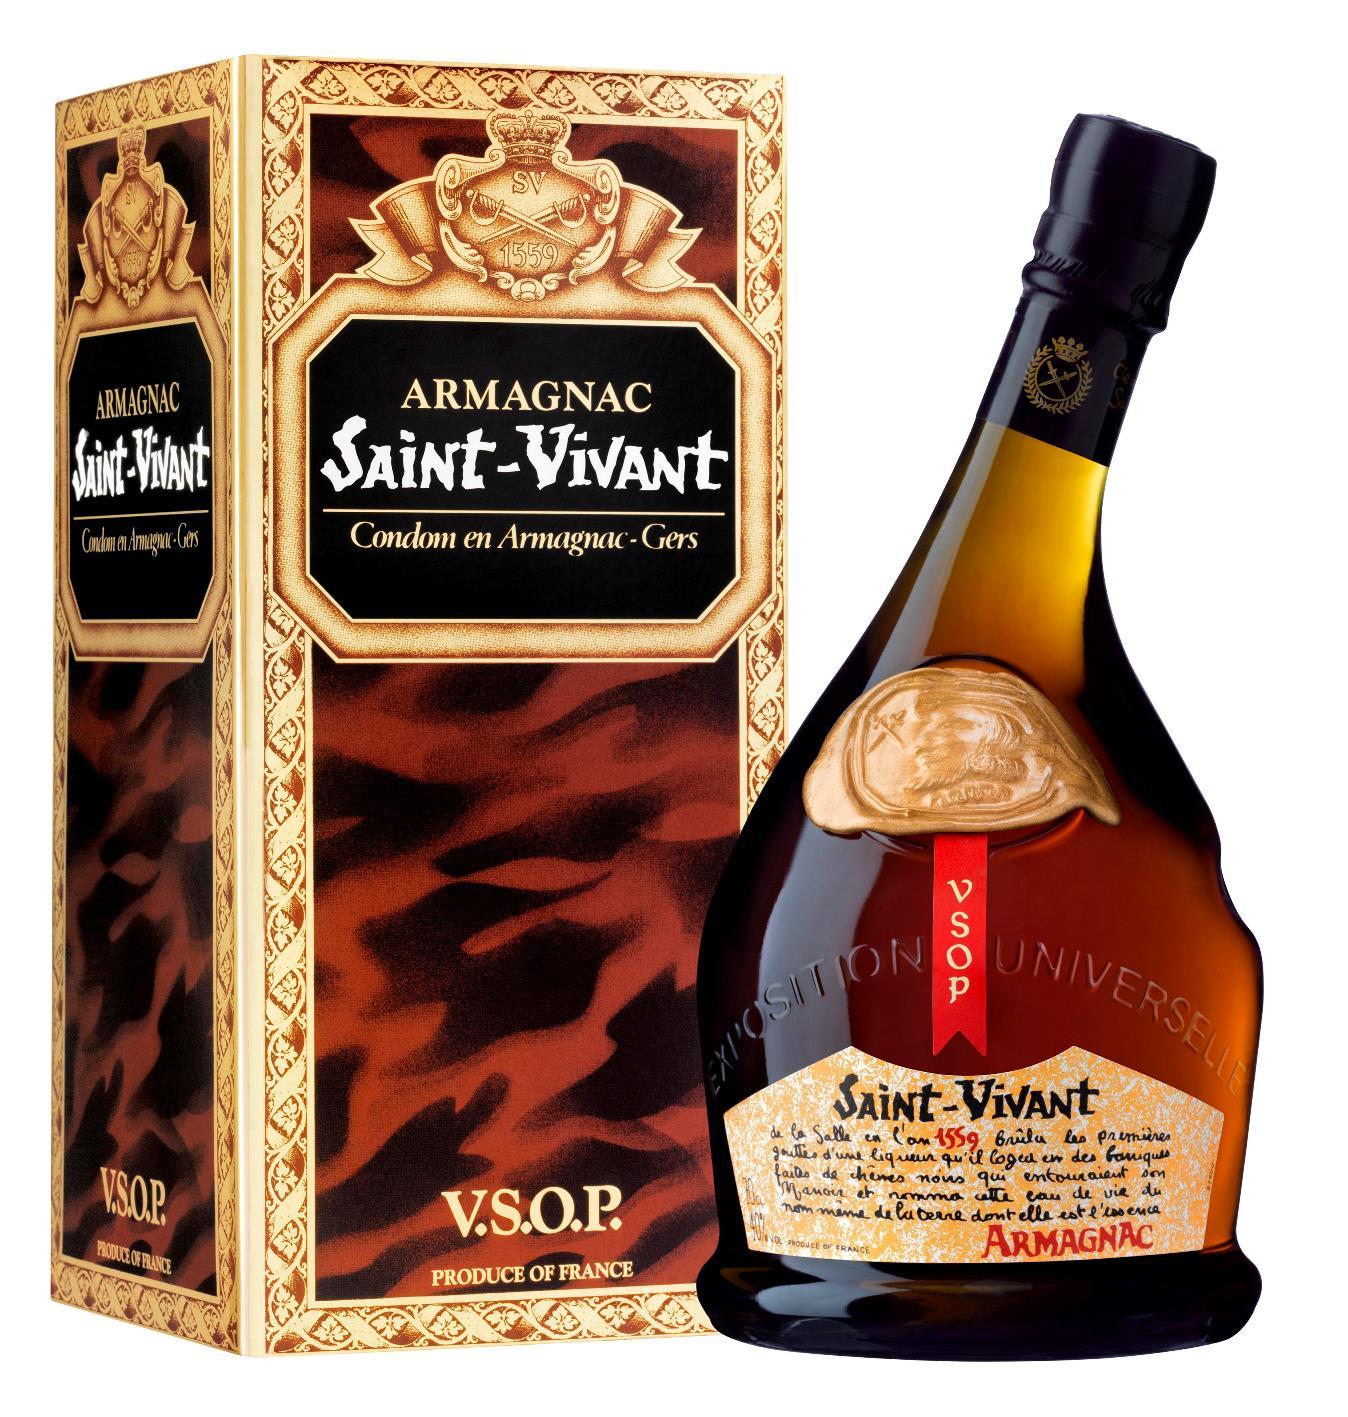 Saint-Vivant Armagnac VSOP 70cl giftbox